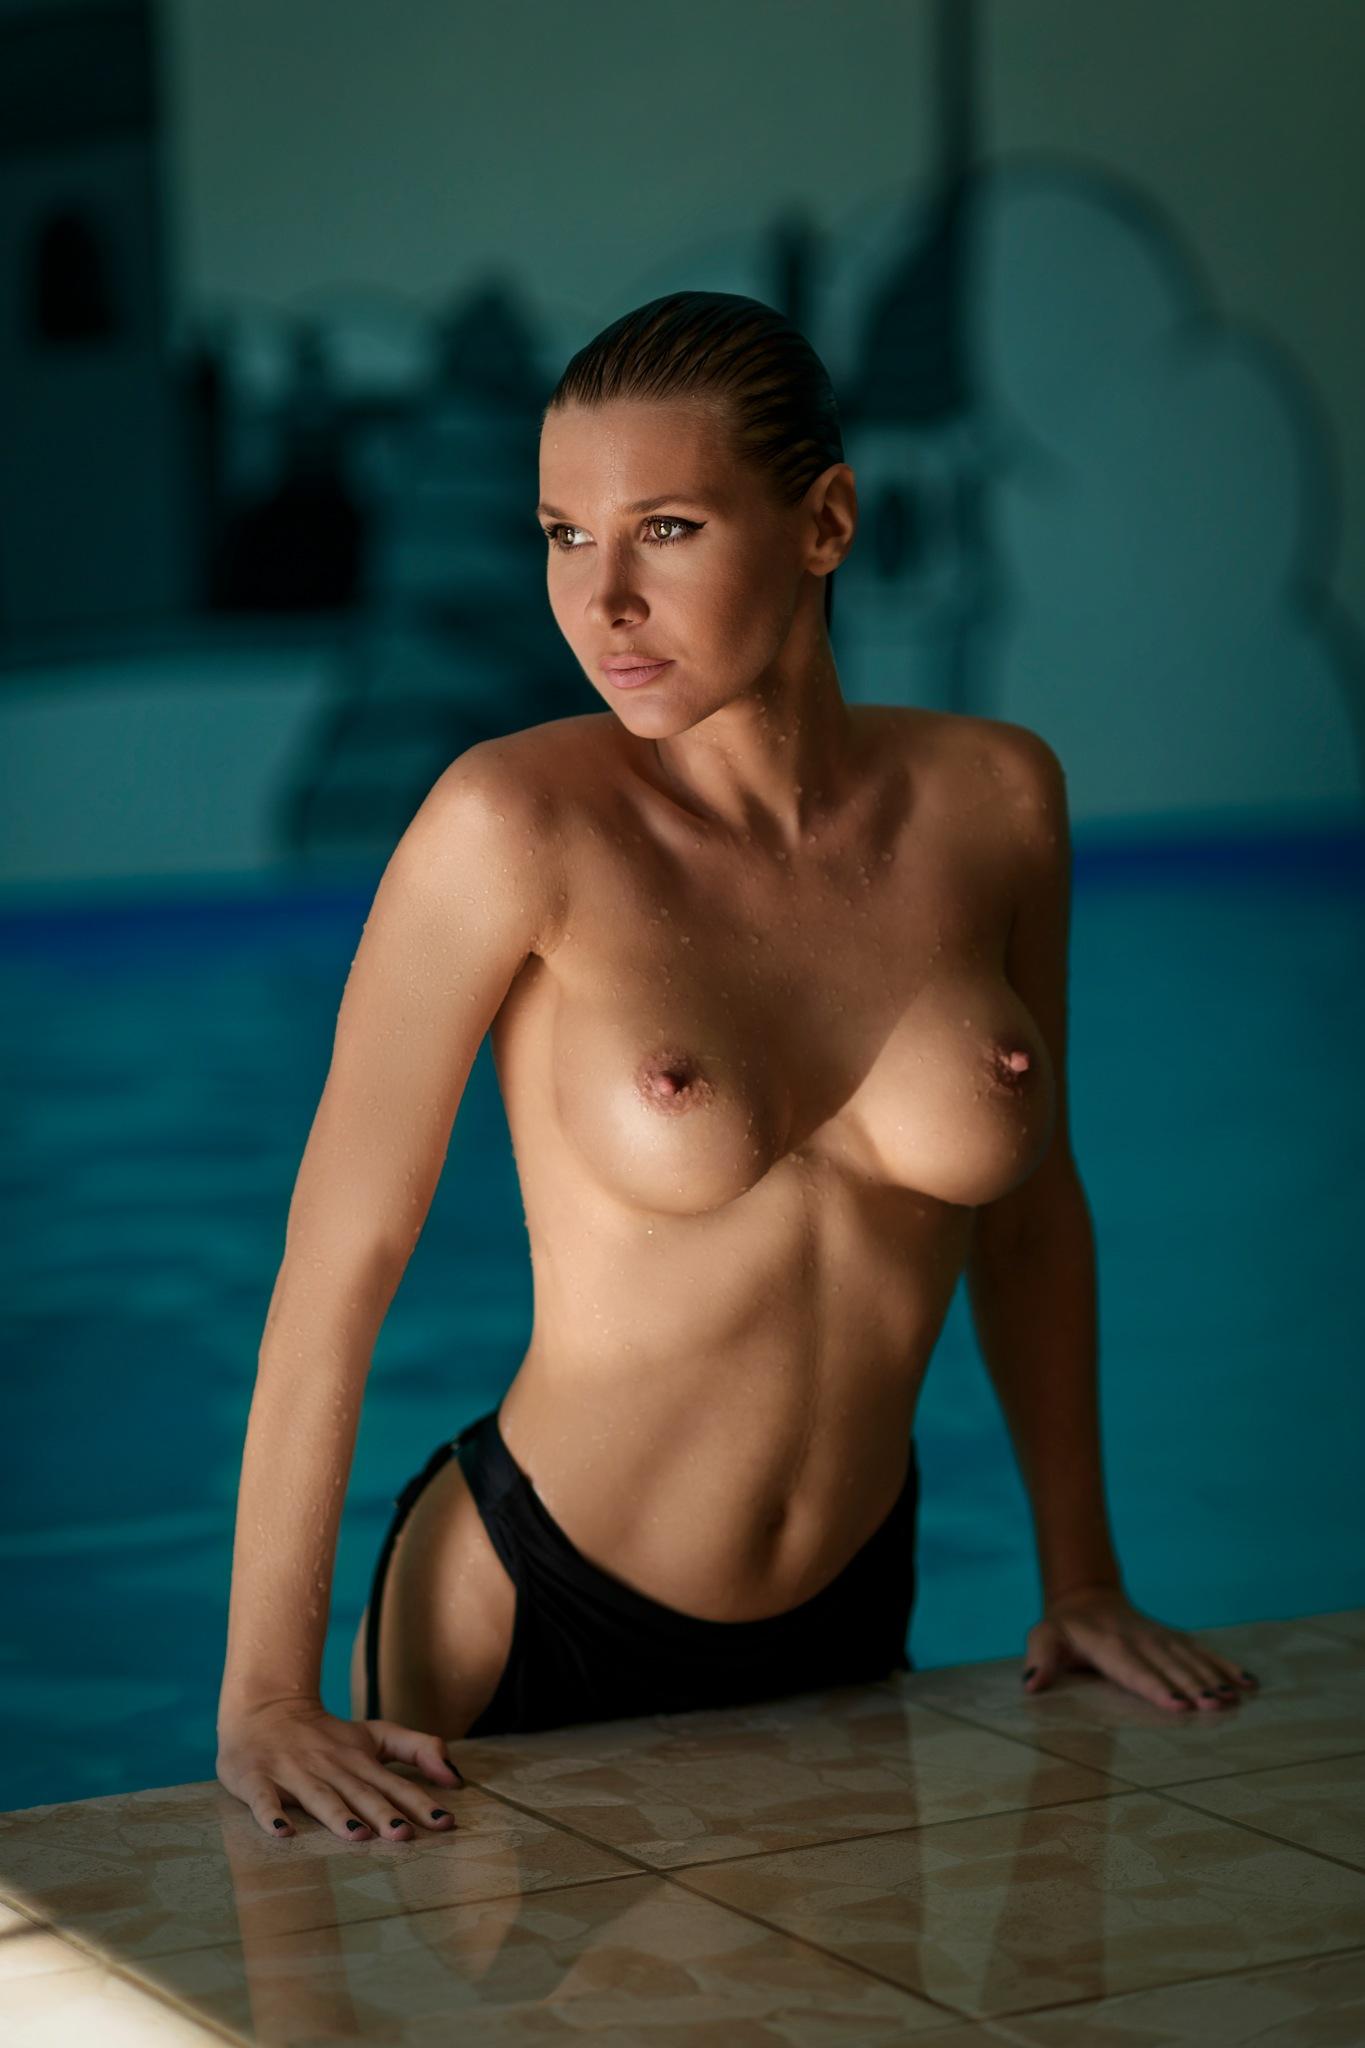 Wet skin by Chris Bos